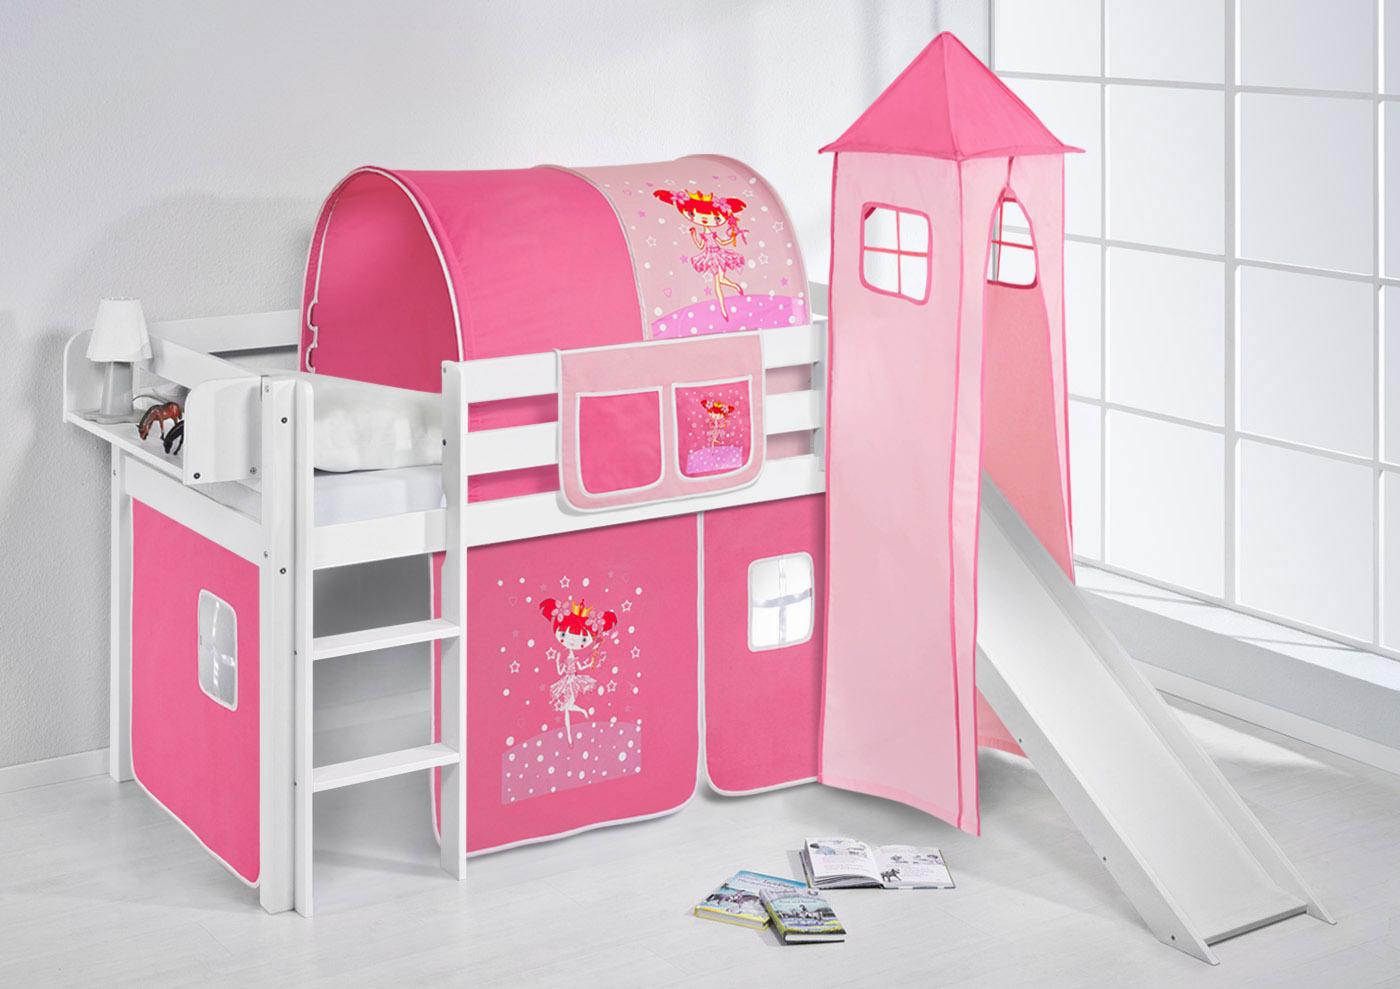 Ikea Corner Cabinet Glass Door ~   Hochbett Kinderbett Kinder Bett JELLE mit Turm und Rutsche + Vorhang